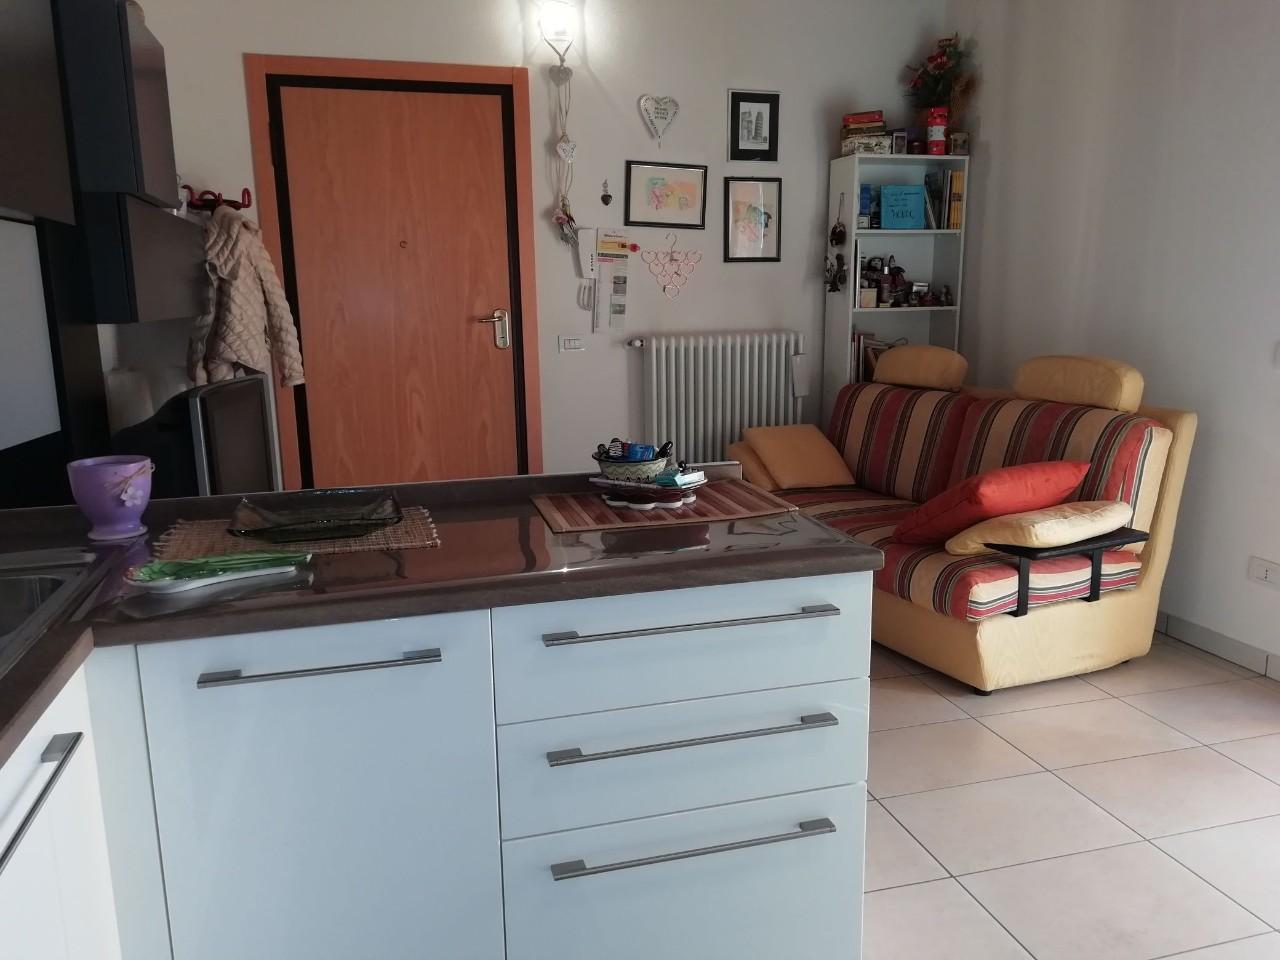 Appartamento in vendita Forli Zona Pievequinta